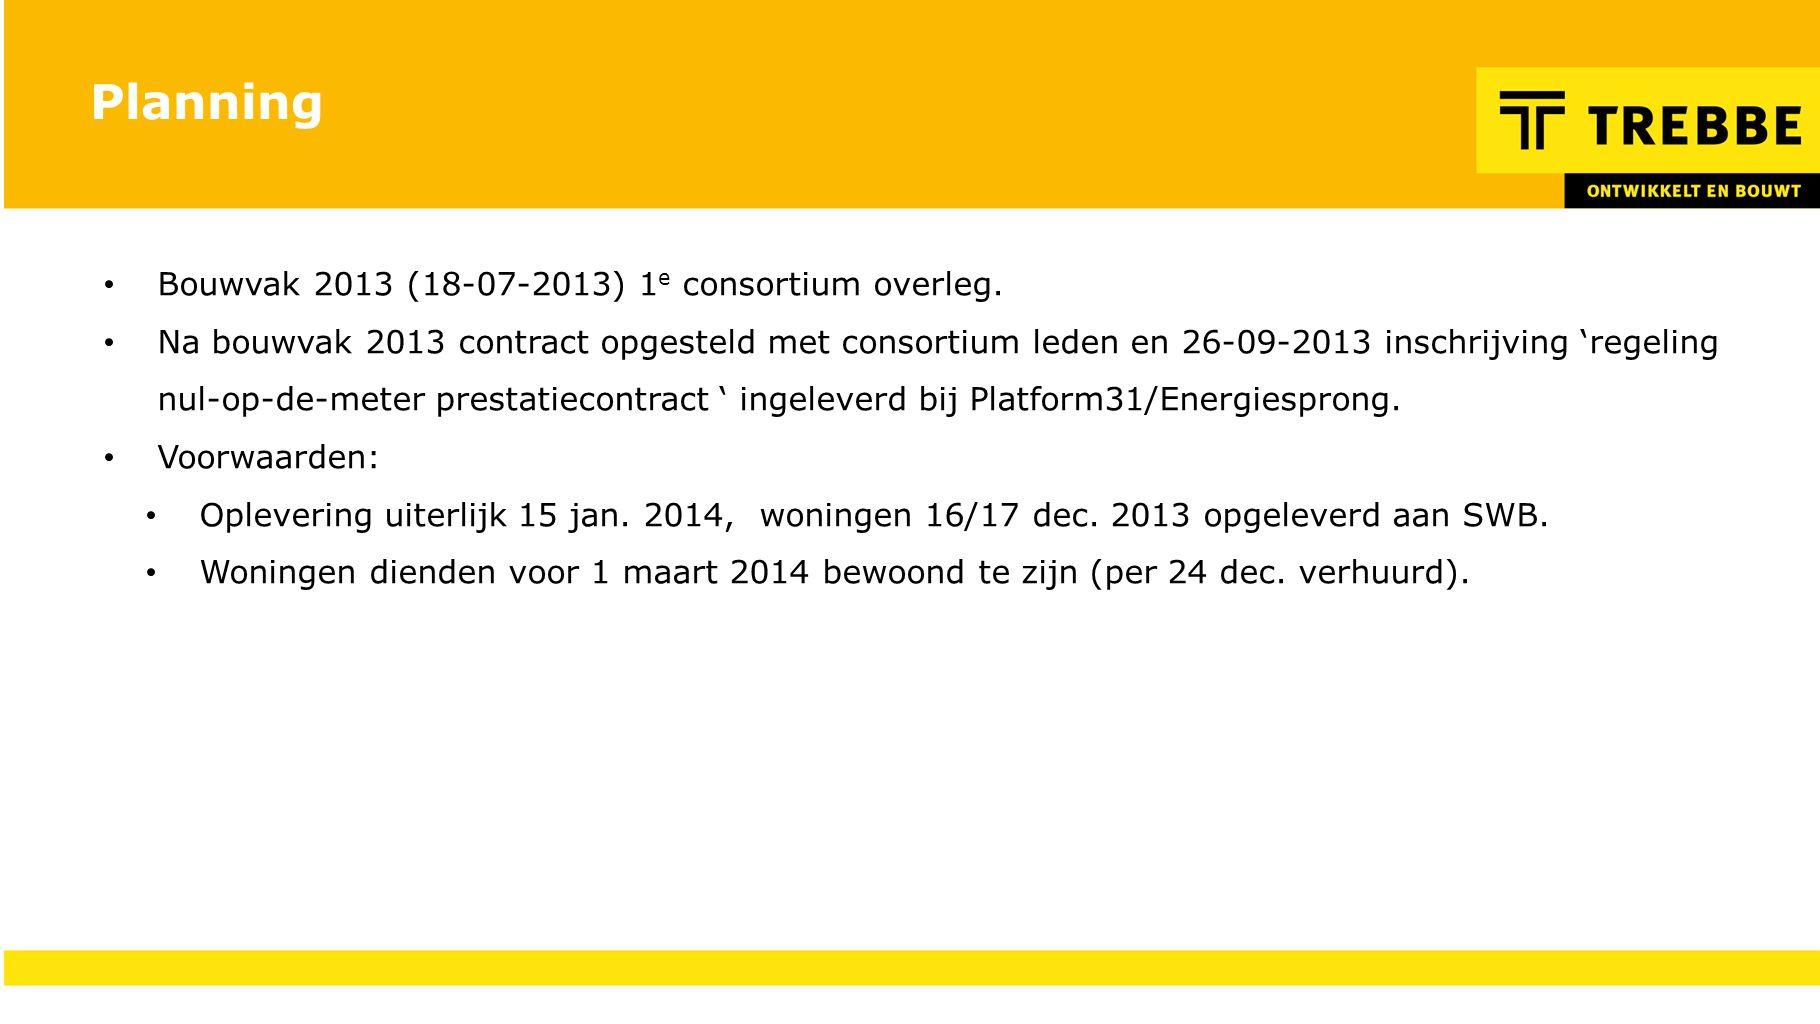 Planning Bouwvak 2013 (18-07-2013) 1e consortium overleg.